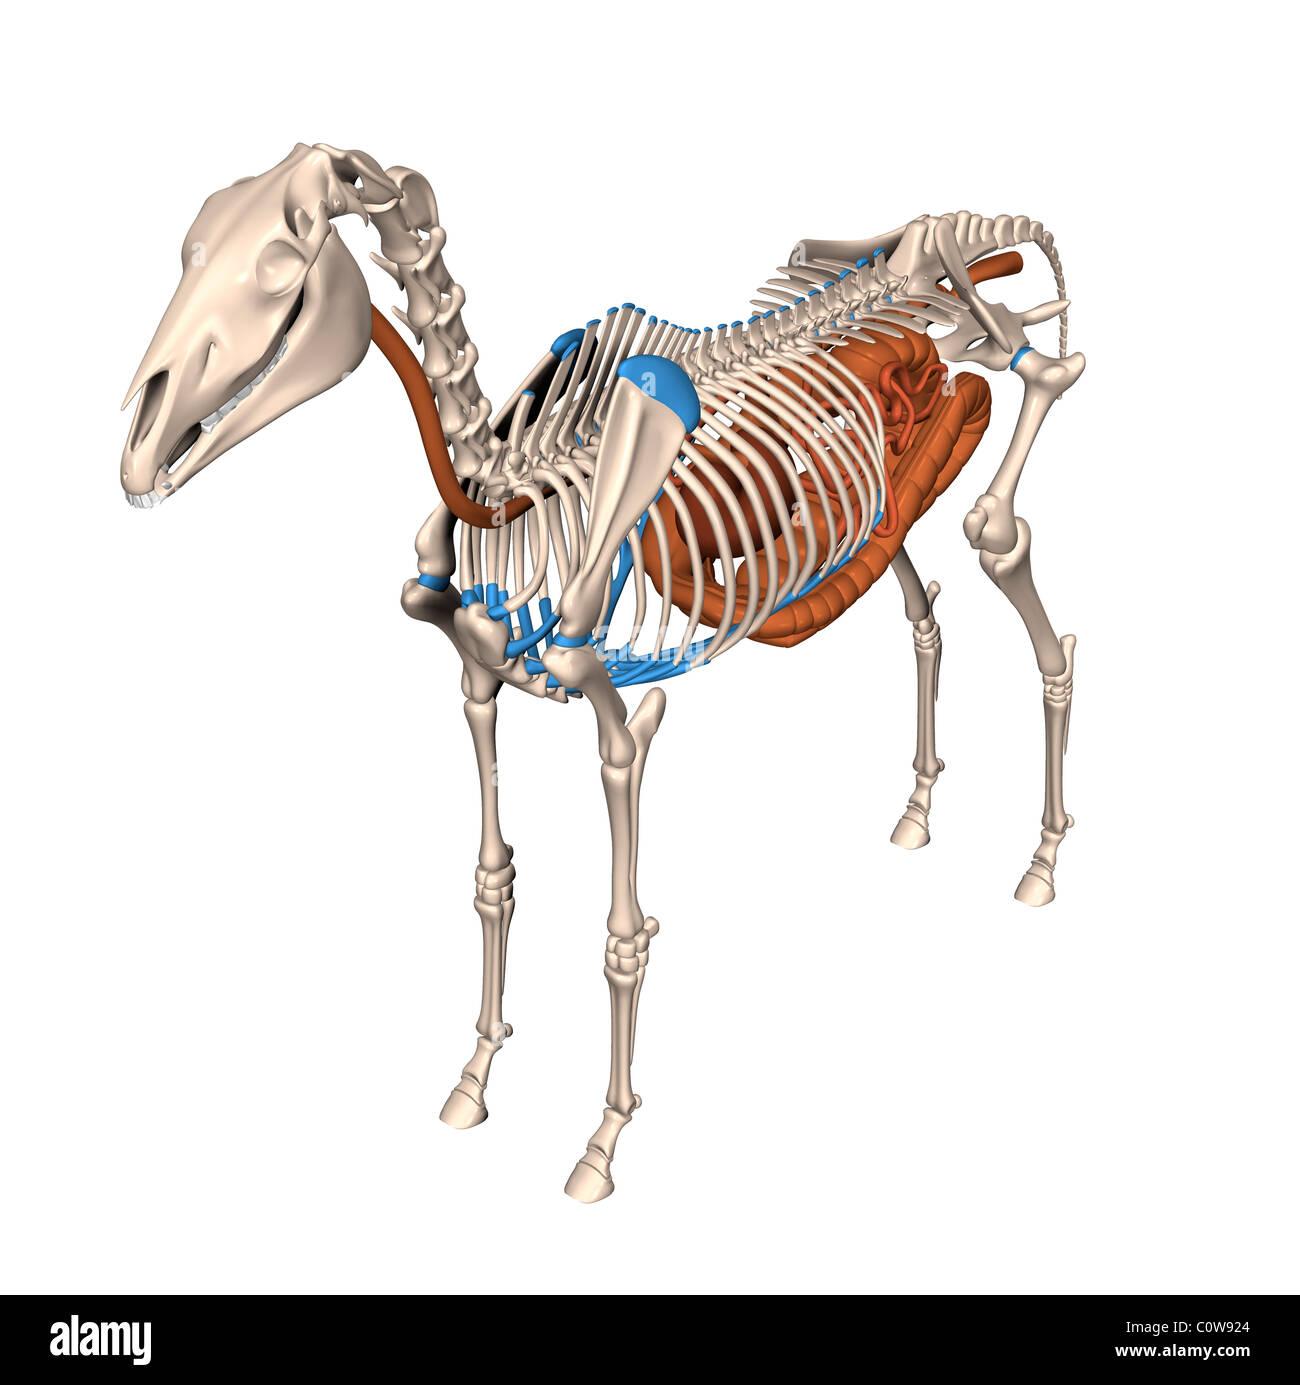 horse anatomy digestion stomach skeleton Stock Photo: 34976652 - Alamy